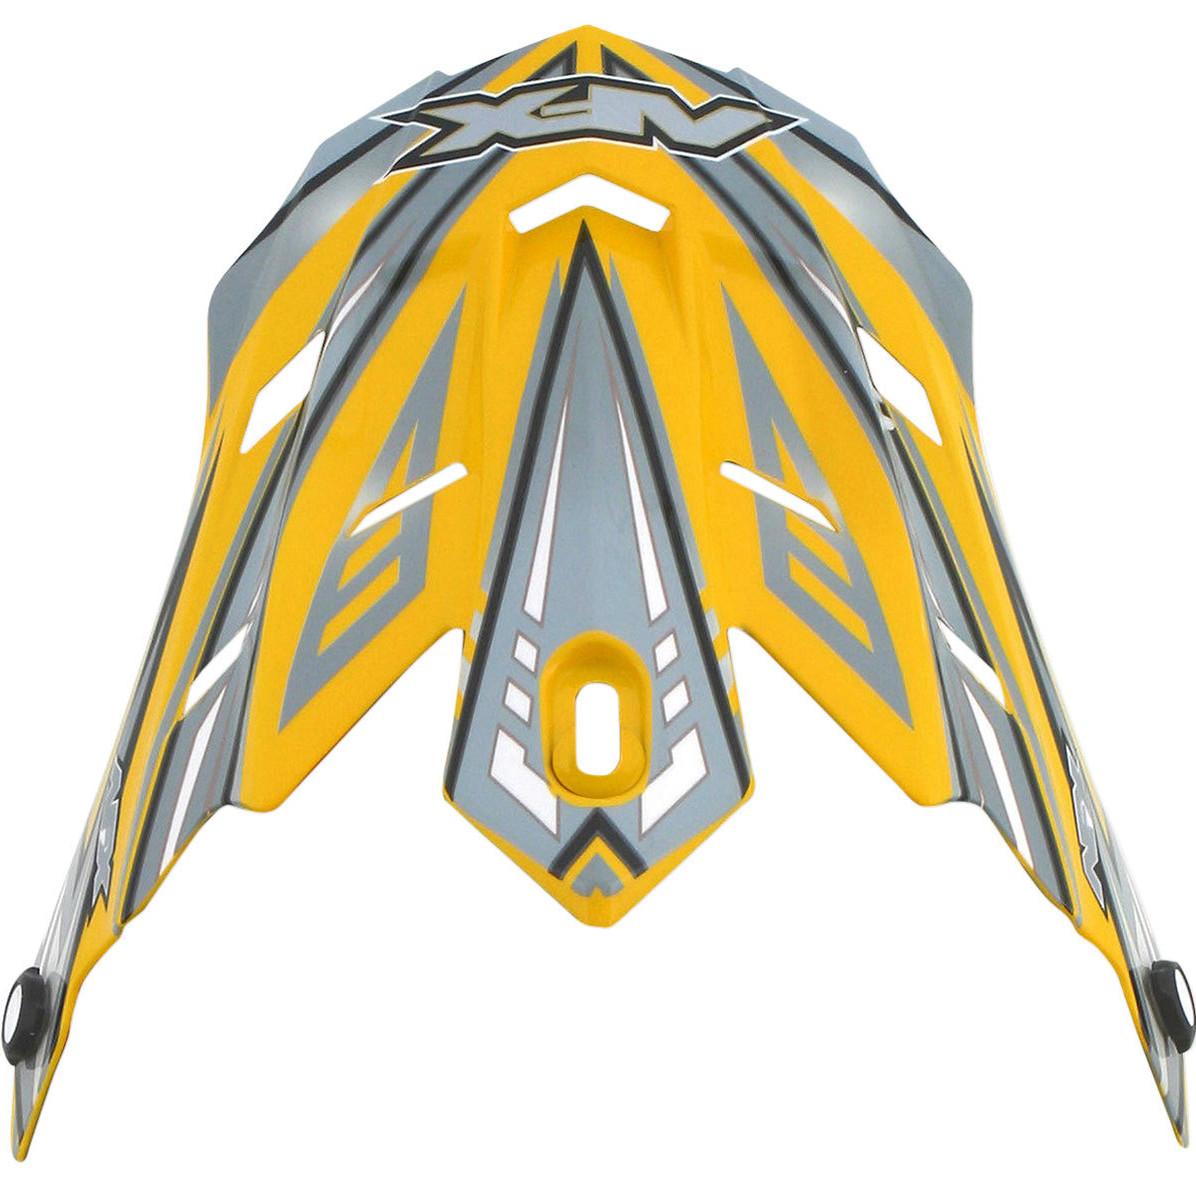 AFX Fx 17 Helmet Peak  2014-afx-fx-17-factor-helmet-peak-mcss.jpg